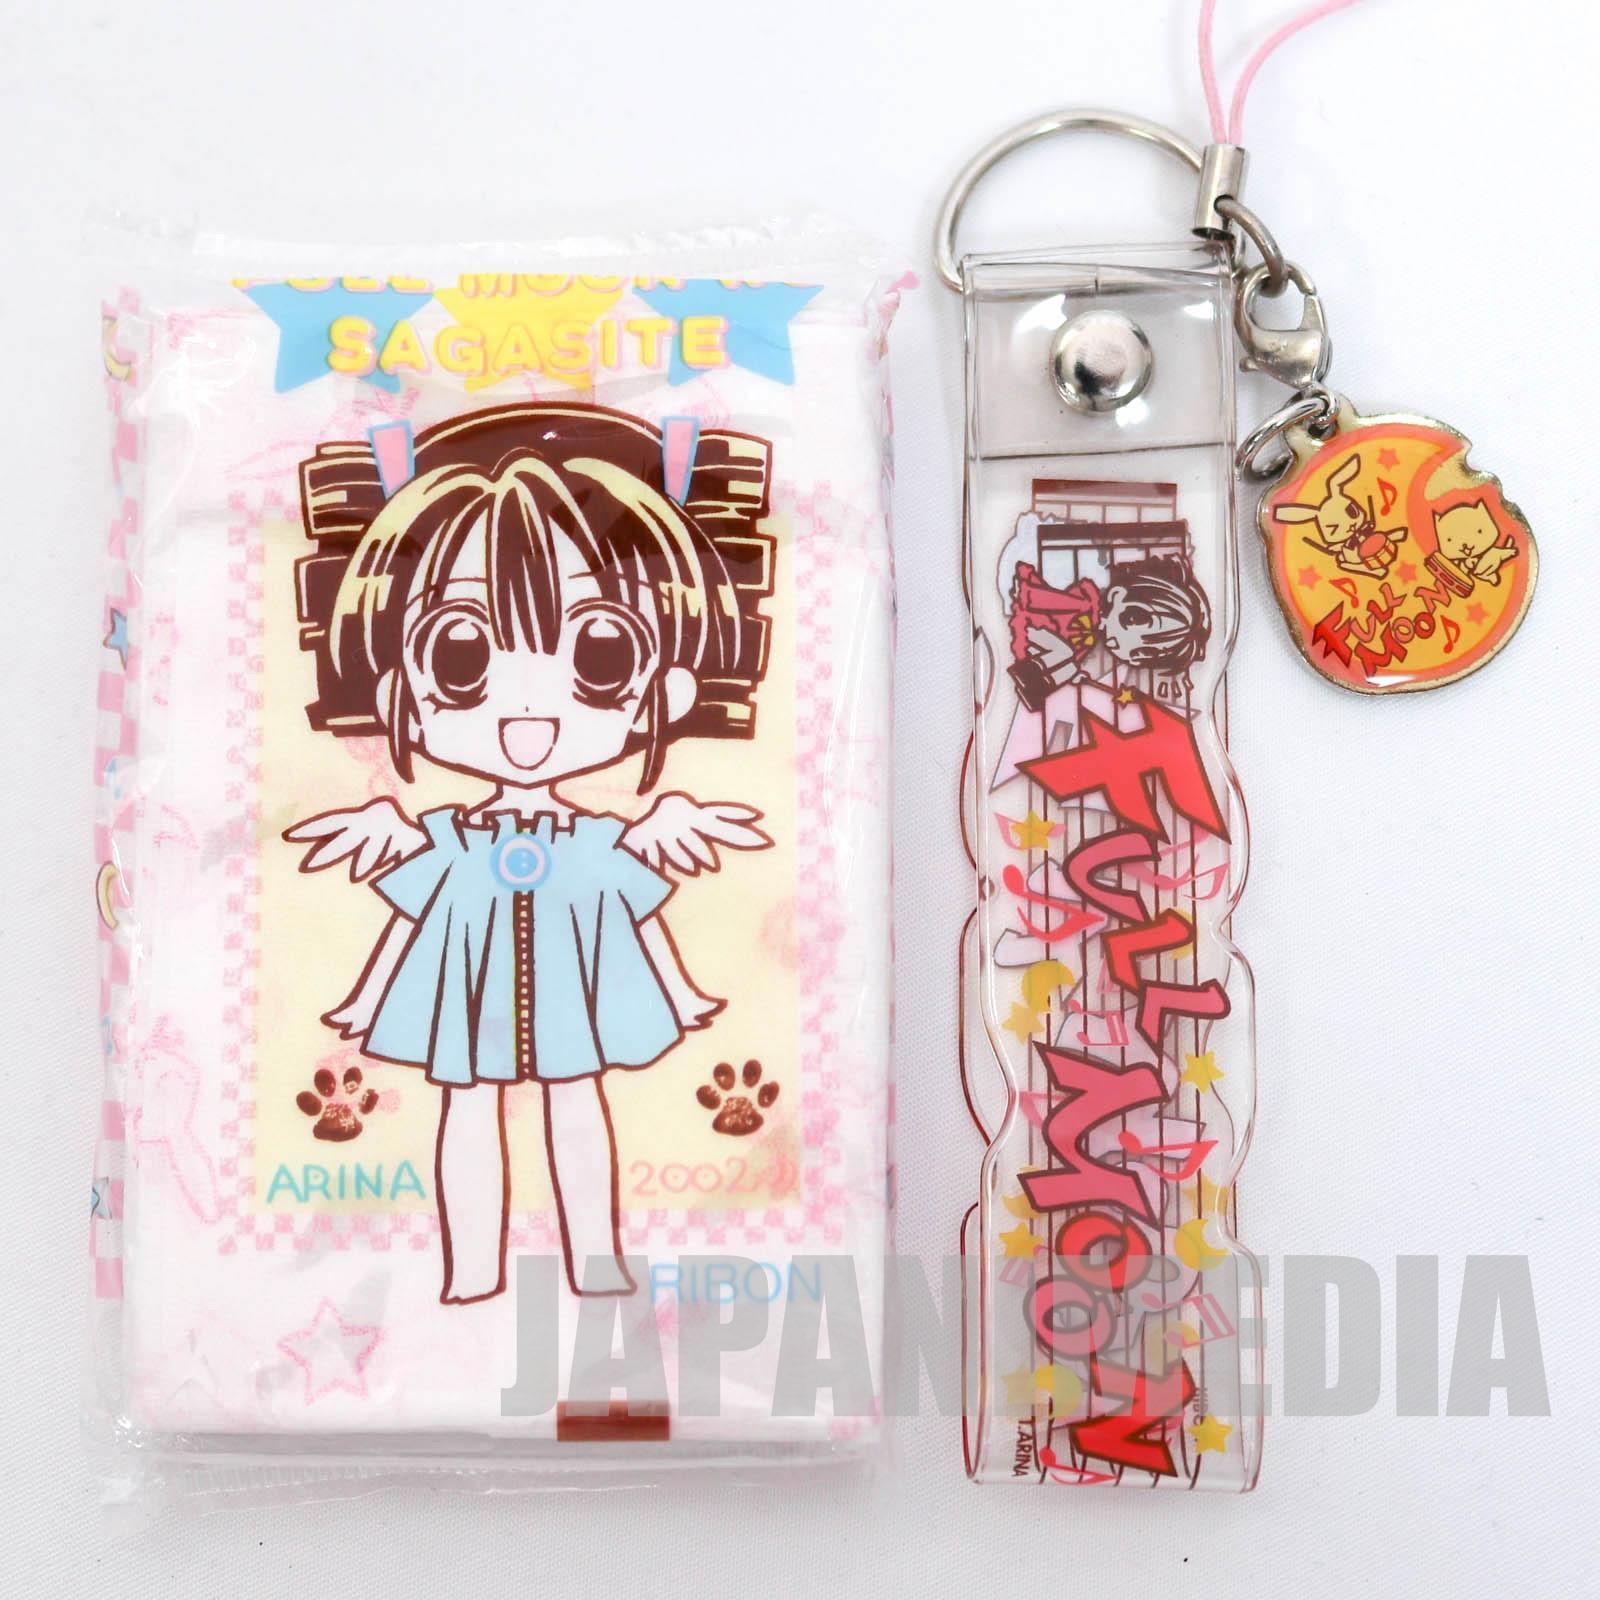 Full Moon o Sagashite Mitsuki Koyama Pocket Tissue & Charm Strap Set JAPAN MANGA